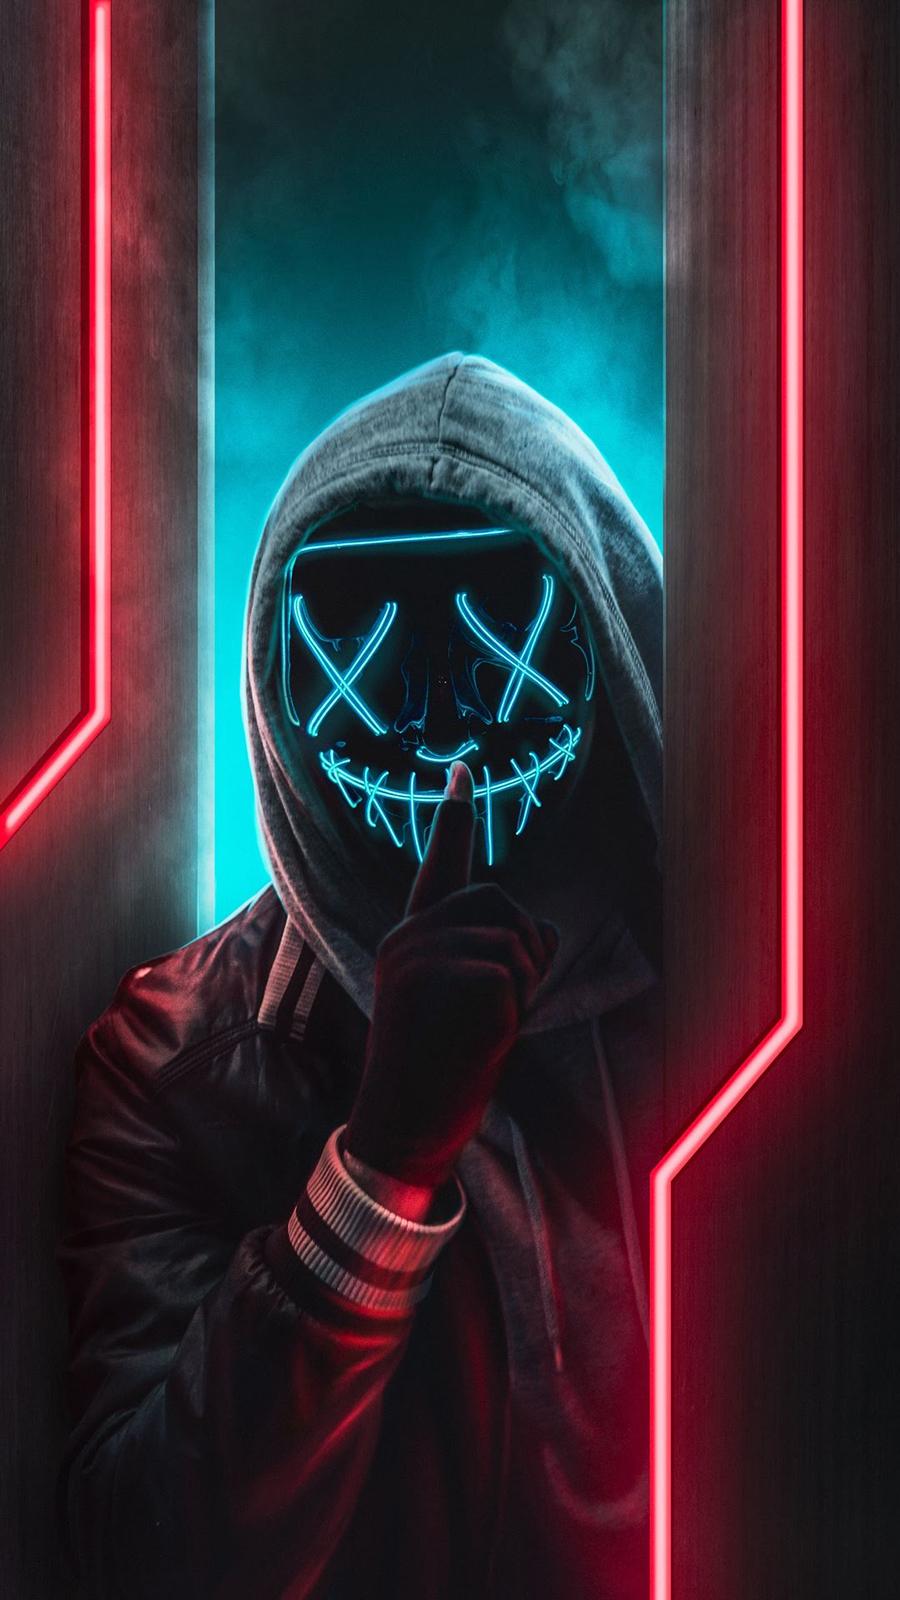 neon mask man wallpaper